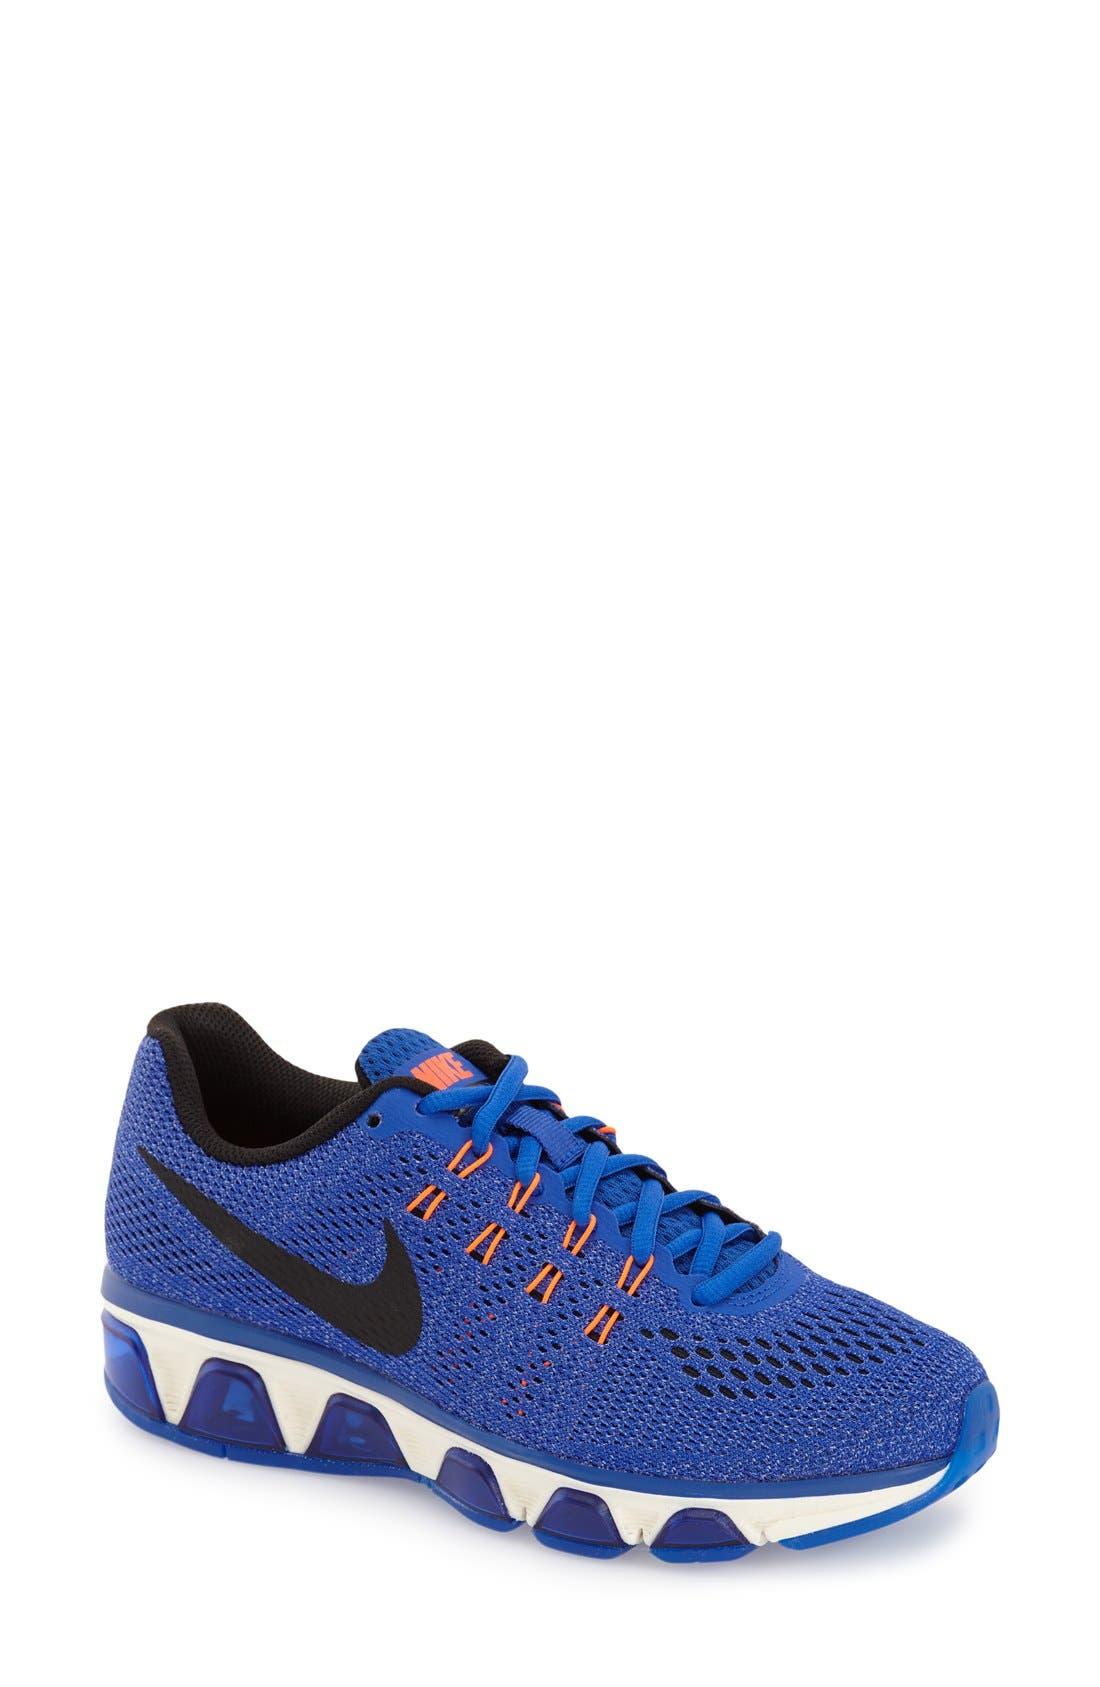 Alternate Image 1 Selected - Nike 'Air Max Tailwind 8' Running Shoe (Women)